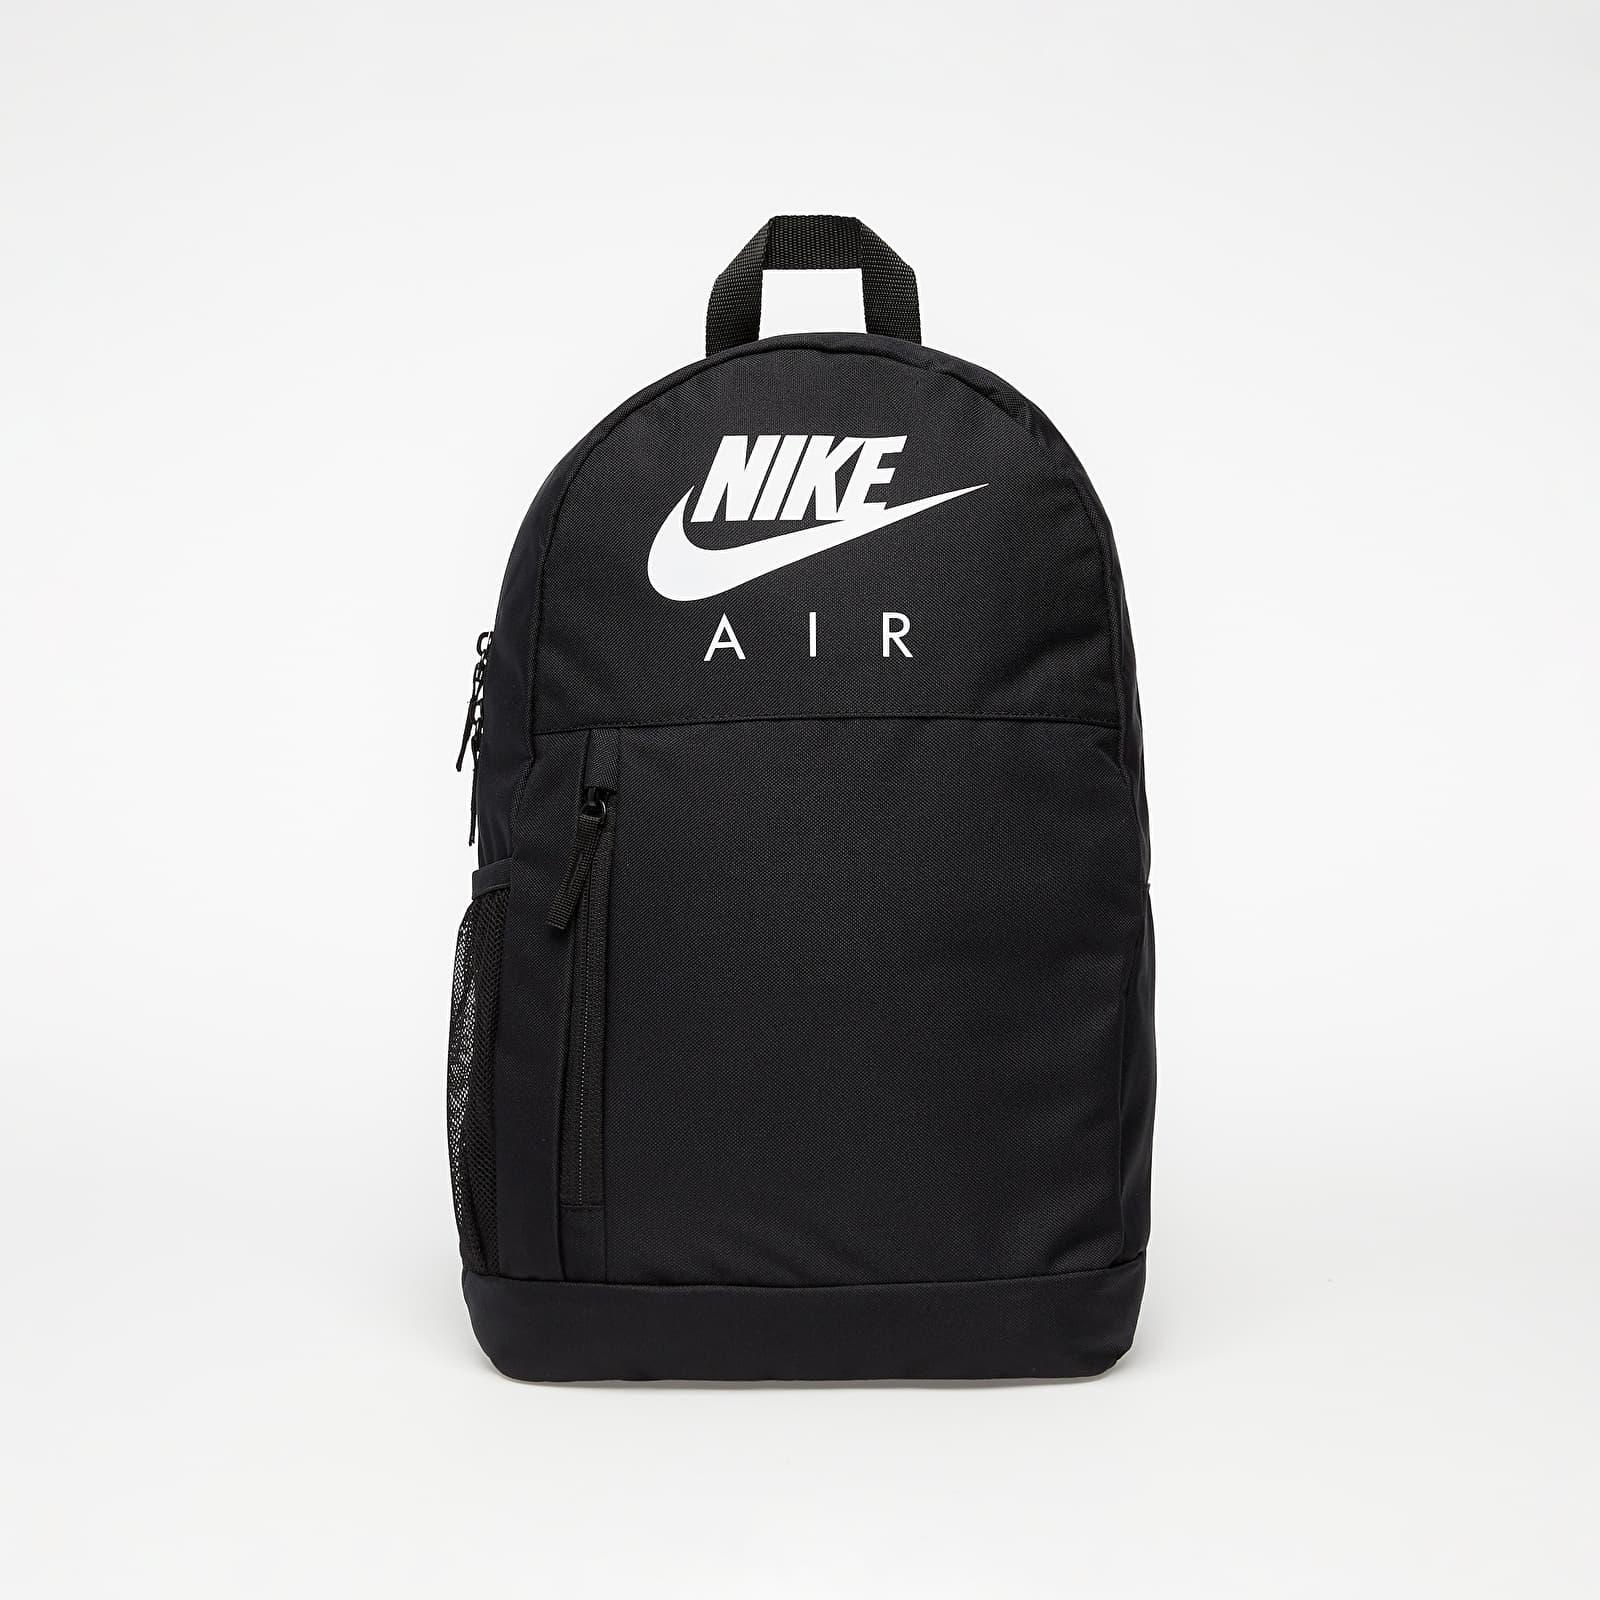 Backpacks Nike Elemental Kids' Backpack Black/ Black/ White